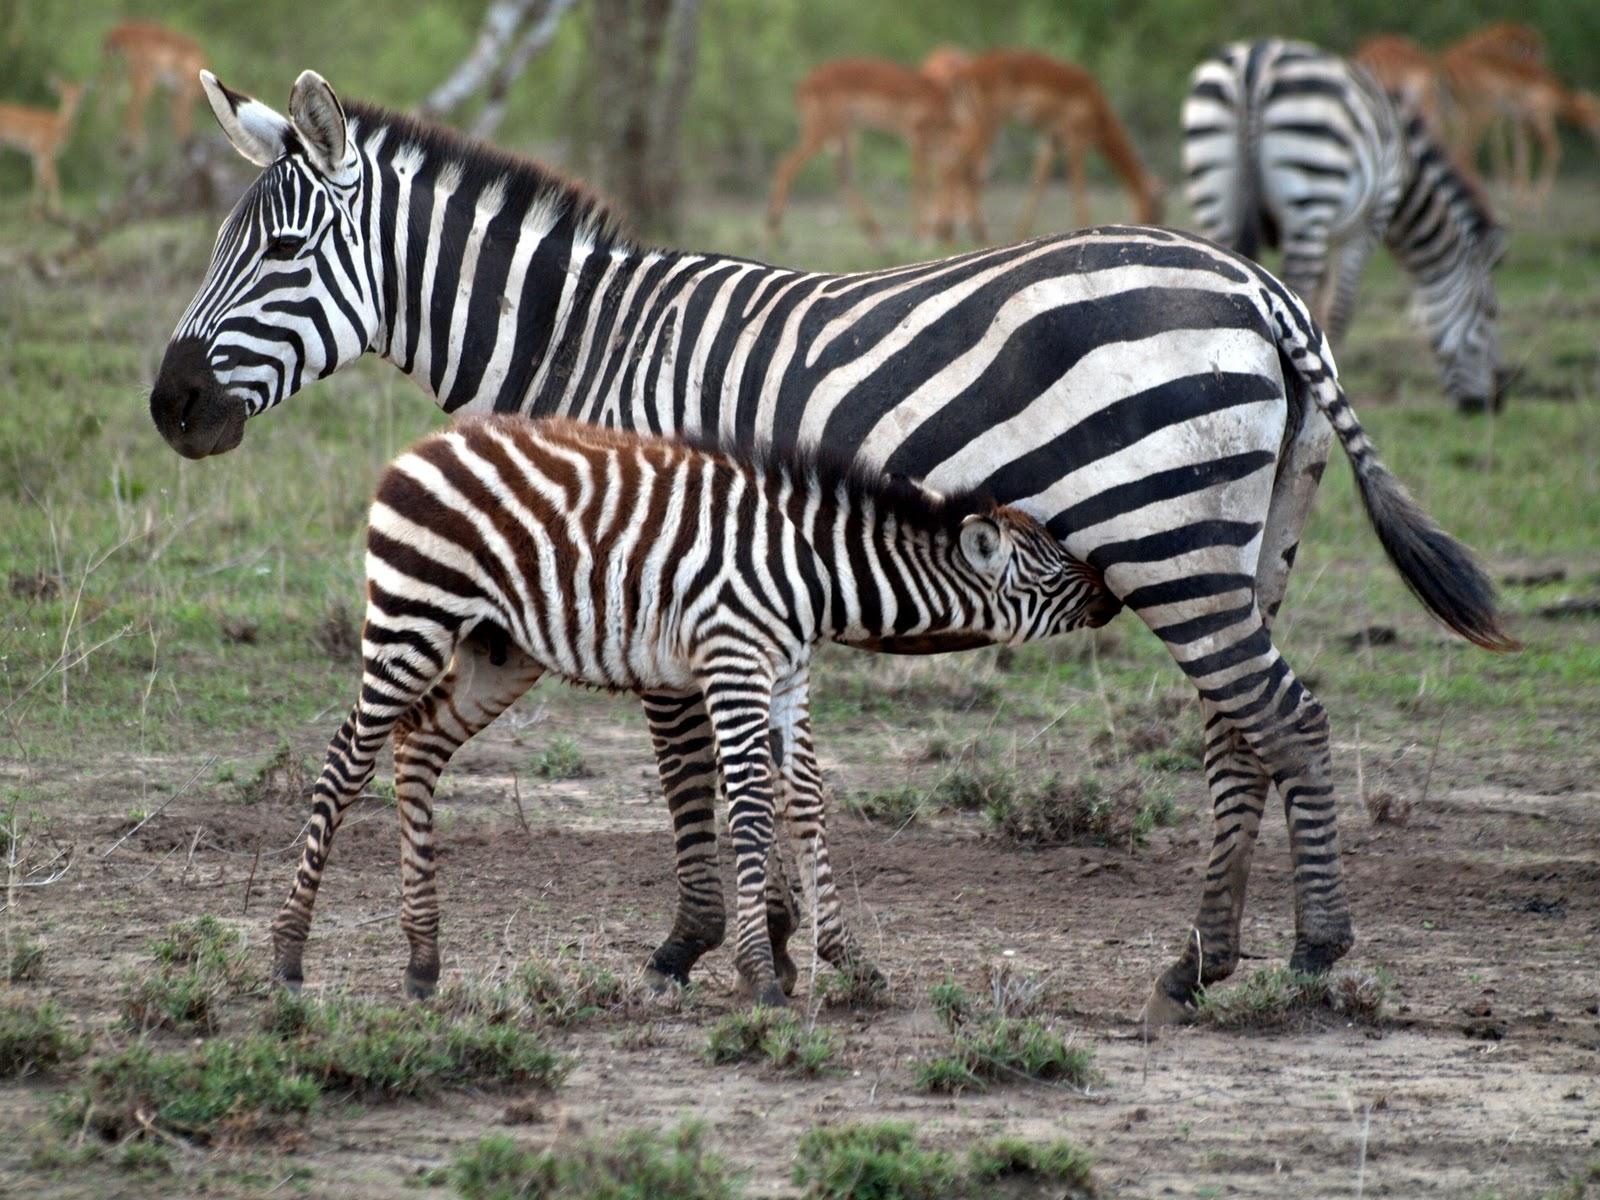 Nursing Zebra #tanzania #zebra #nursingzebra #africa 2011